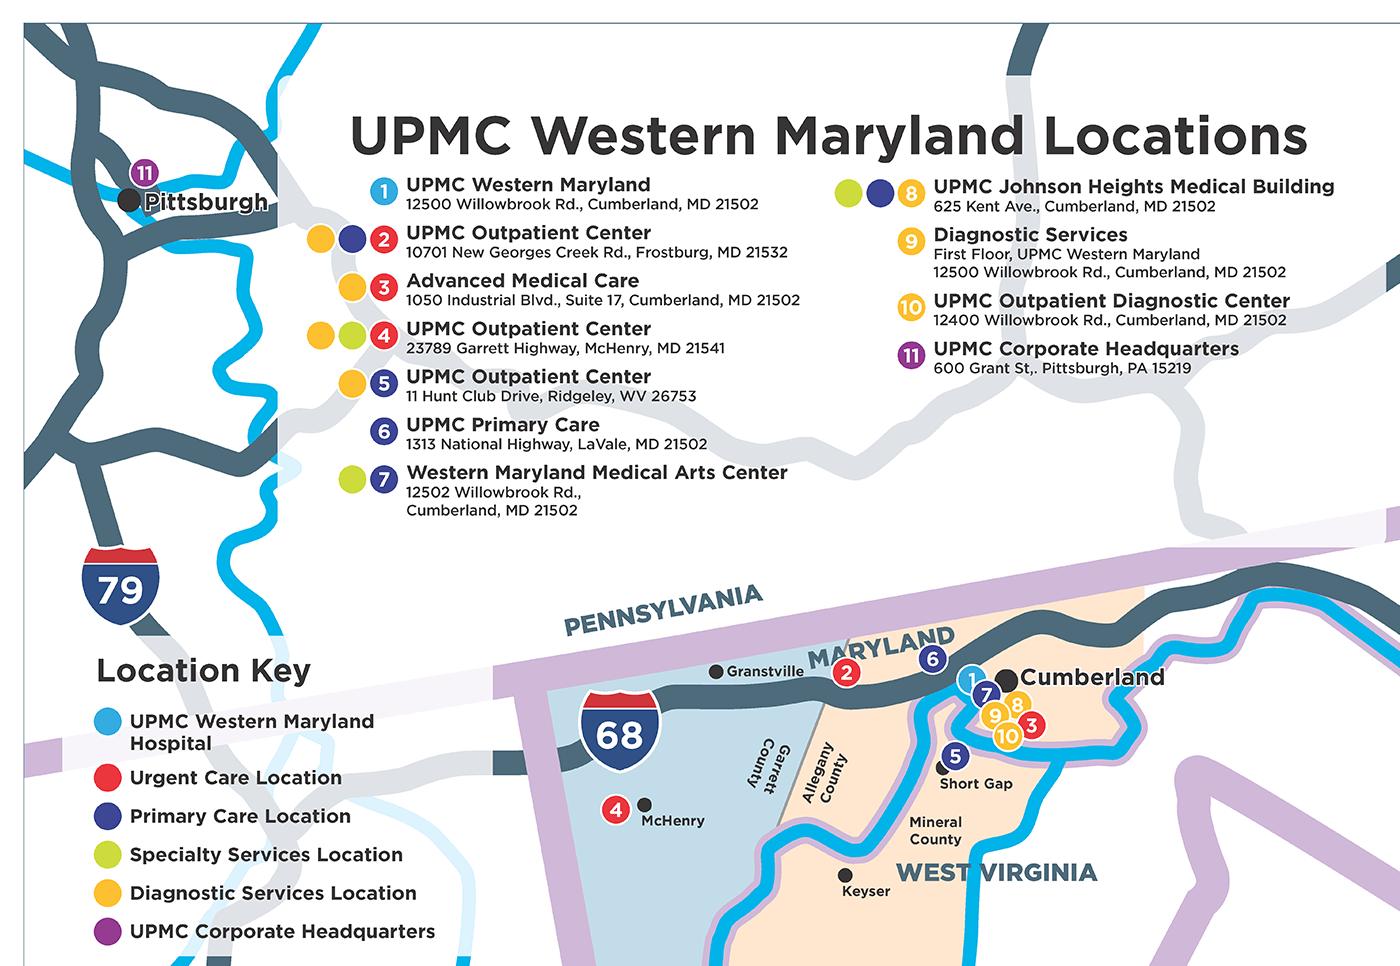 UPMC Western Maryland Locations